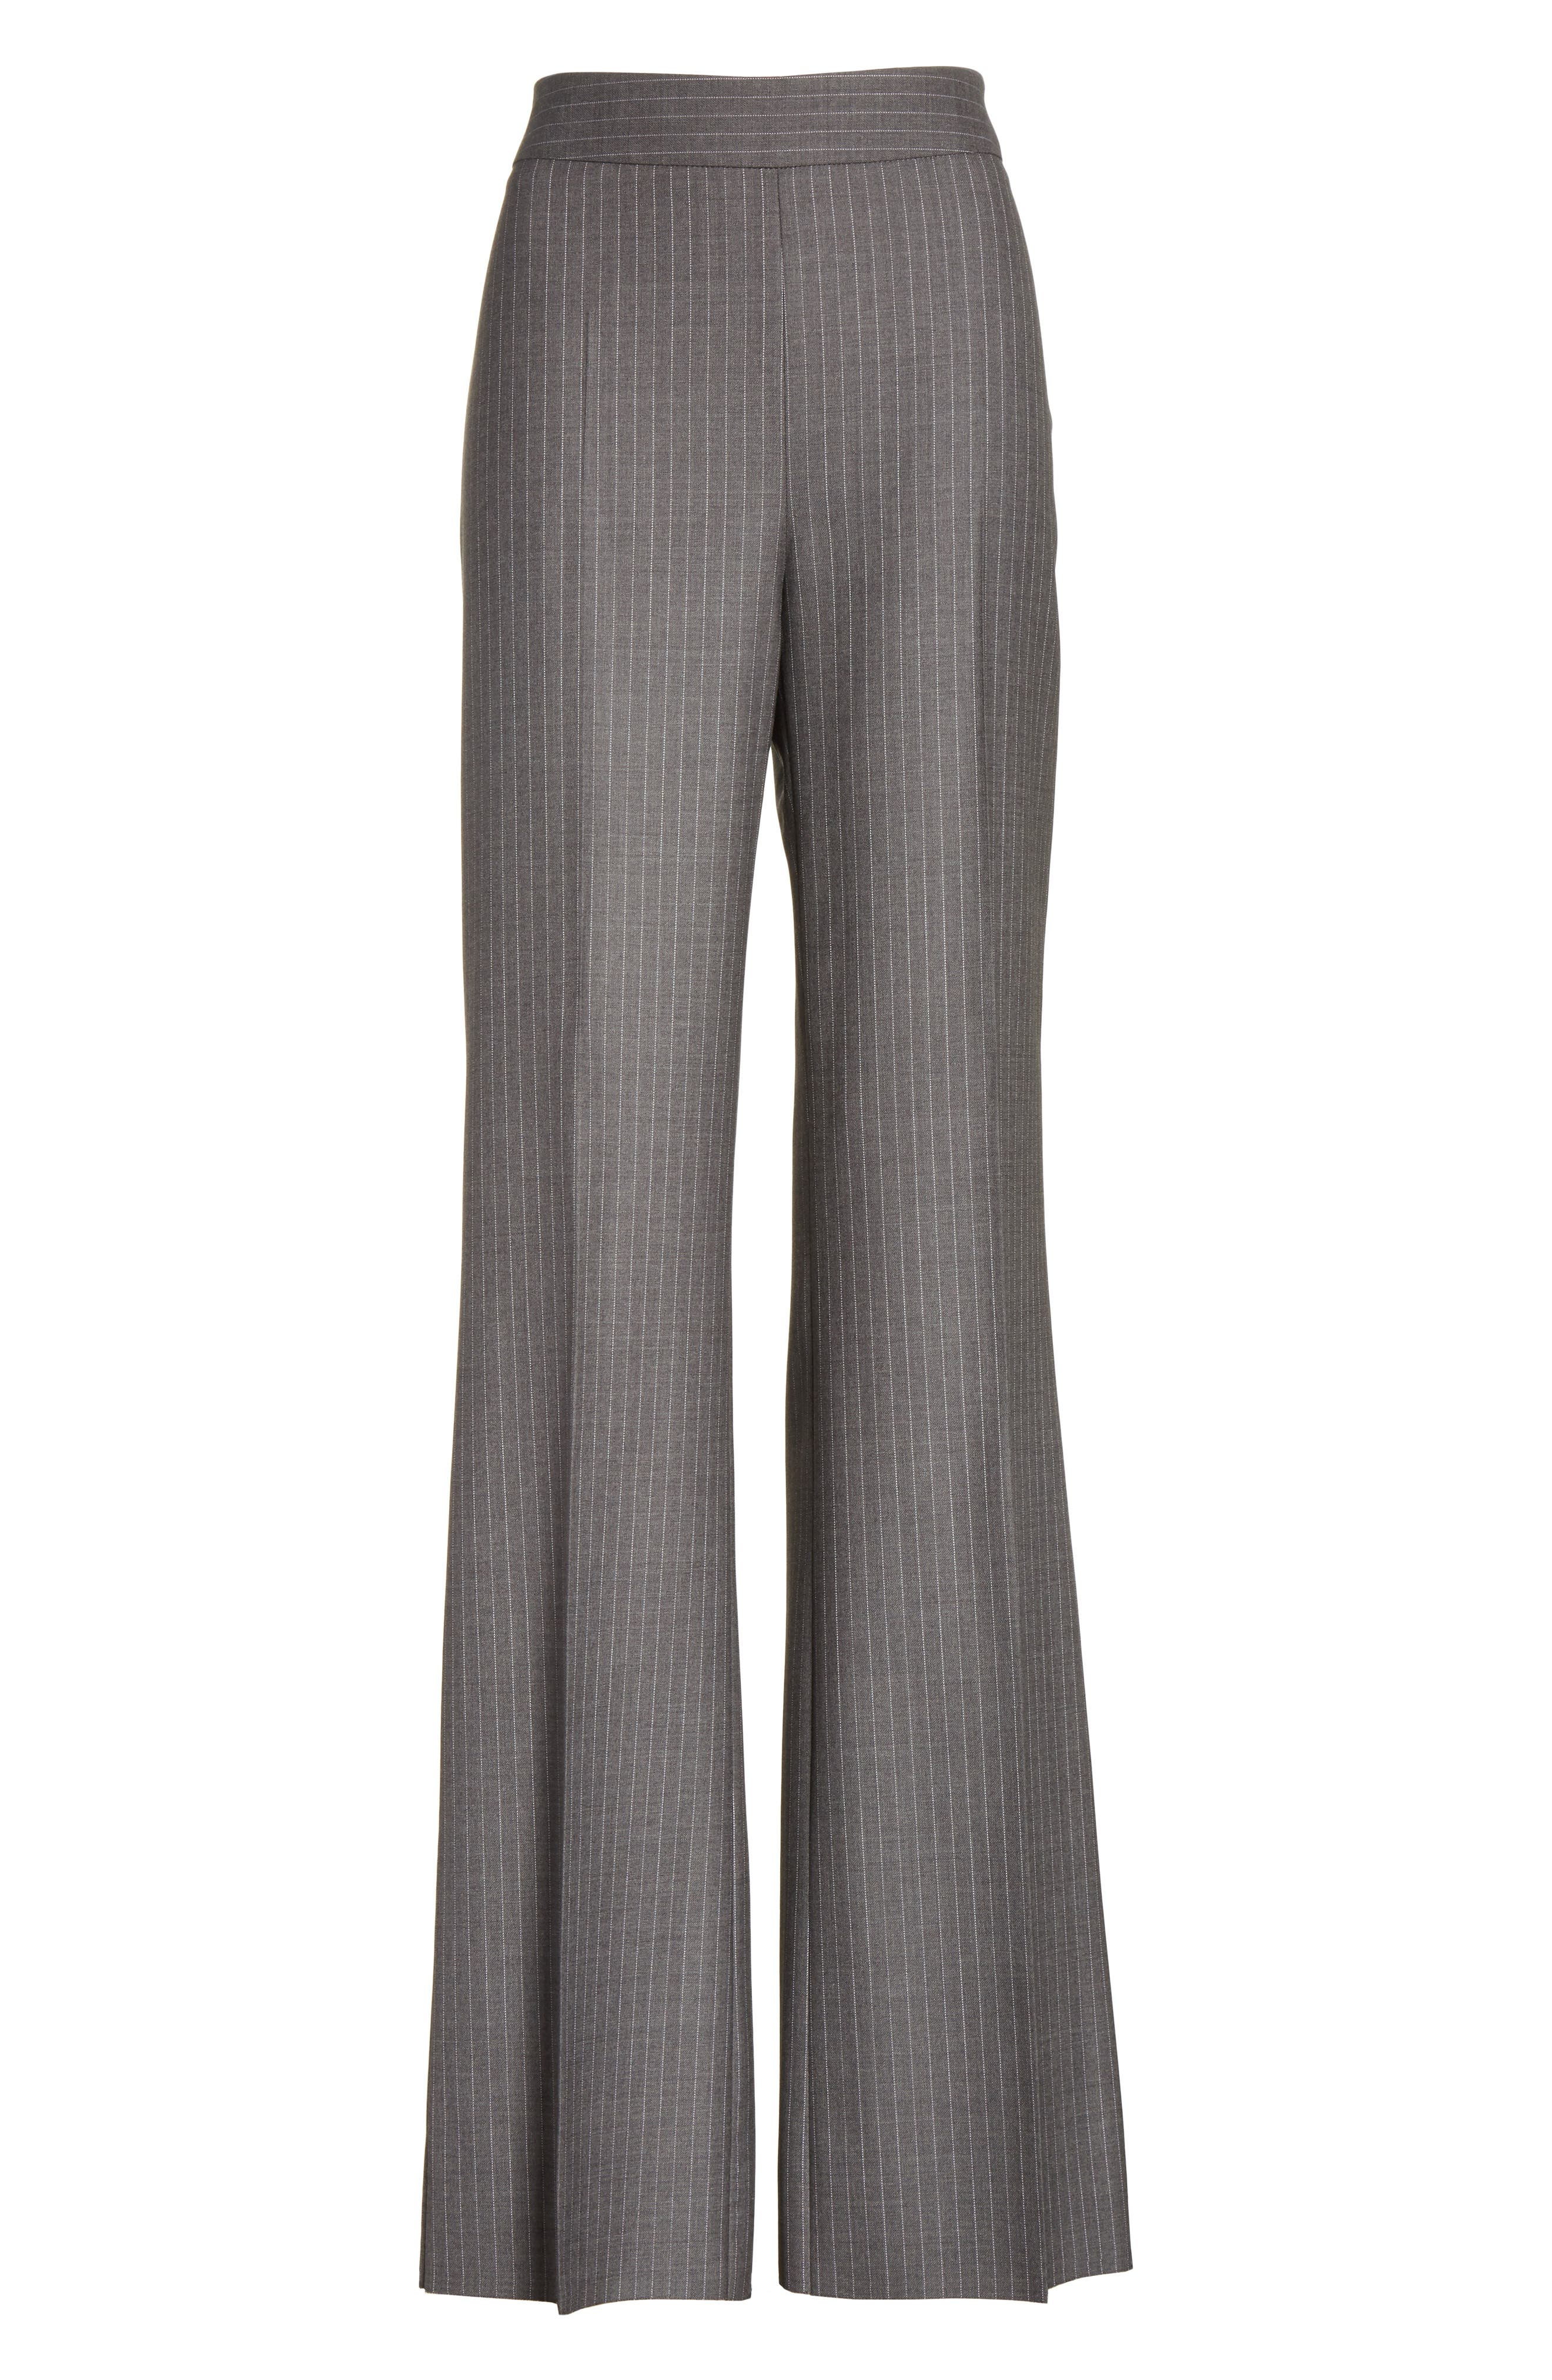 Garibo Stretch Wool Pinstripe Pants,                             Alternate thumbnail 6, color,